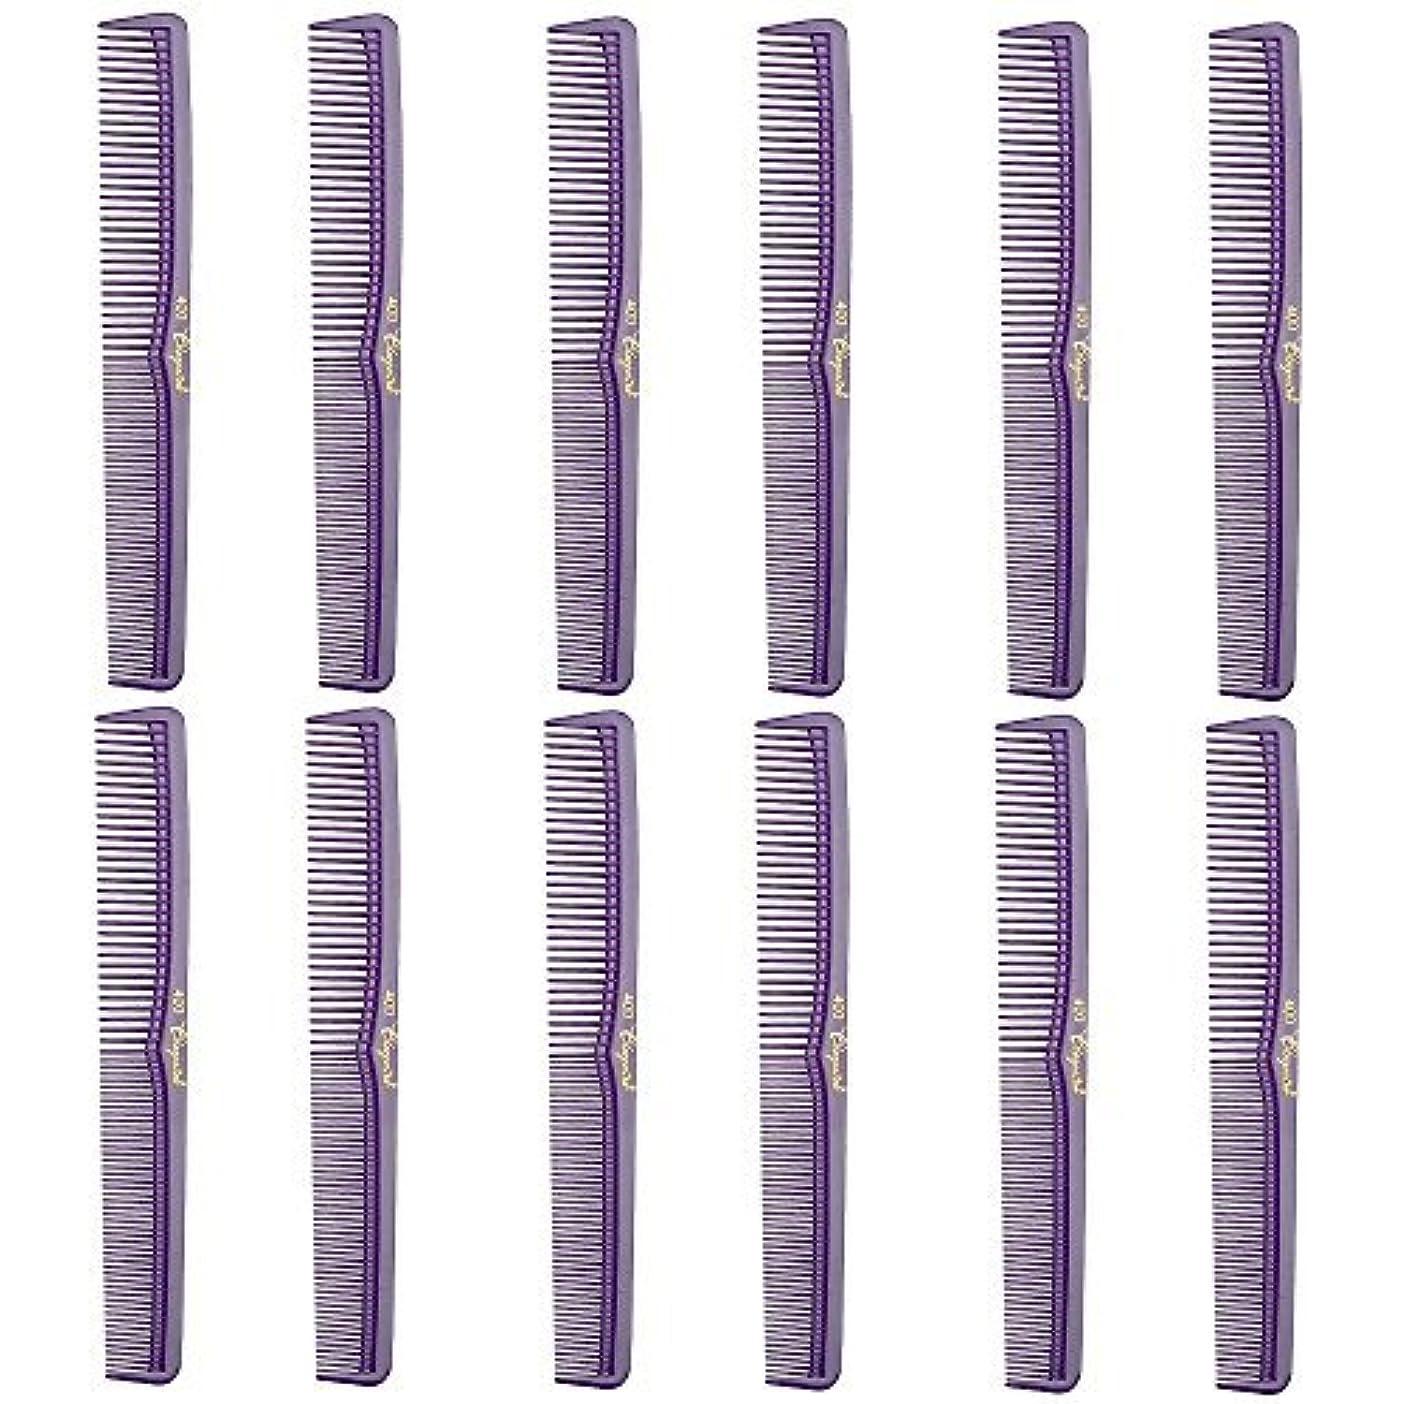 抹消多用途秋Barber Beauty Hair Cleopatra 400 All Purpose Comb (12 Pack) 12 x SB-C400-PURPLE [並行輸入品]